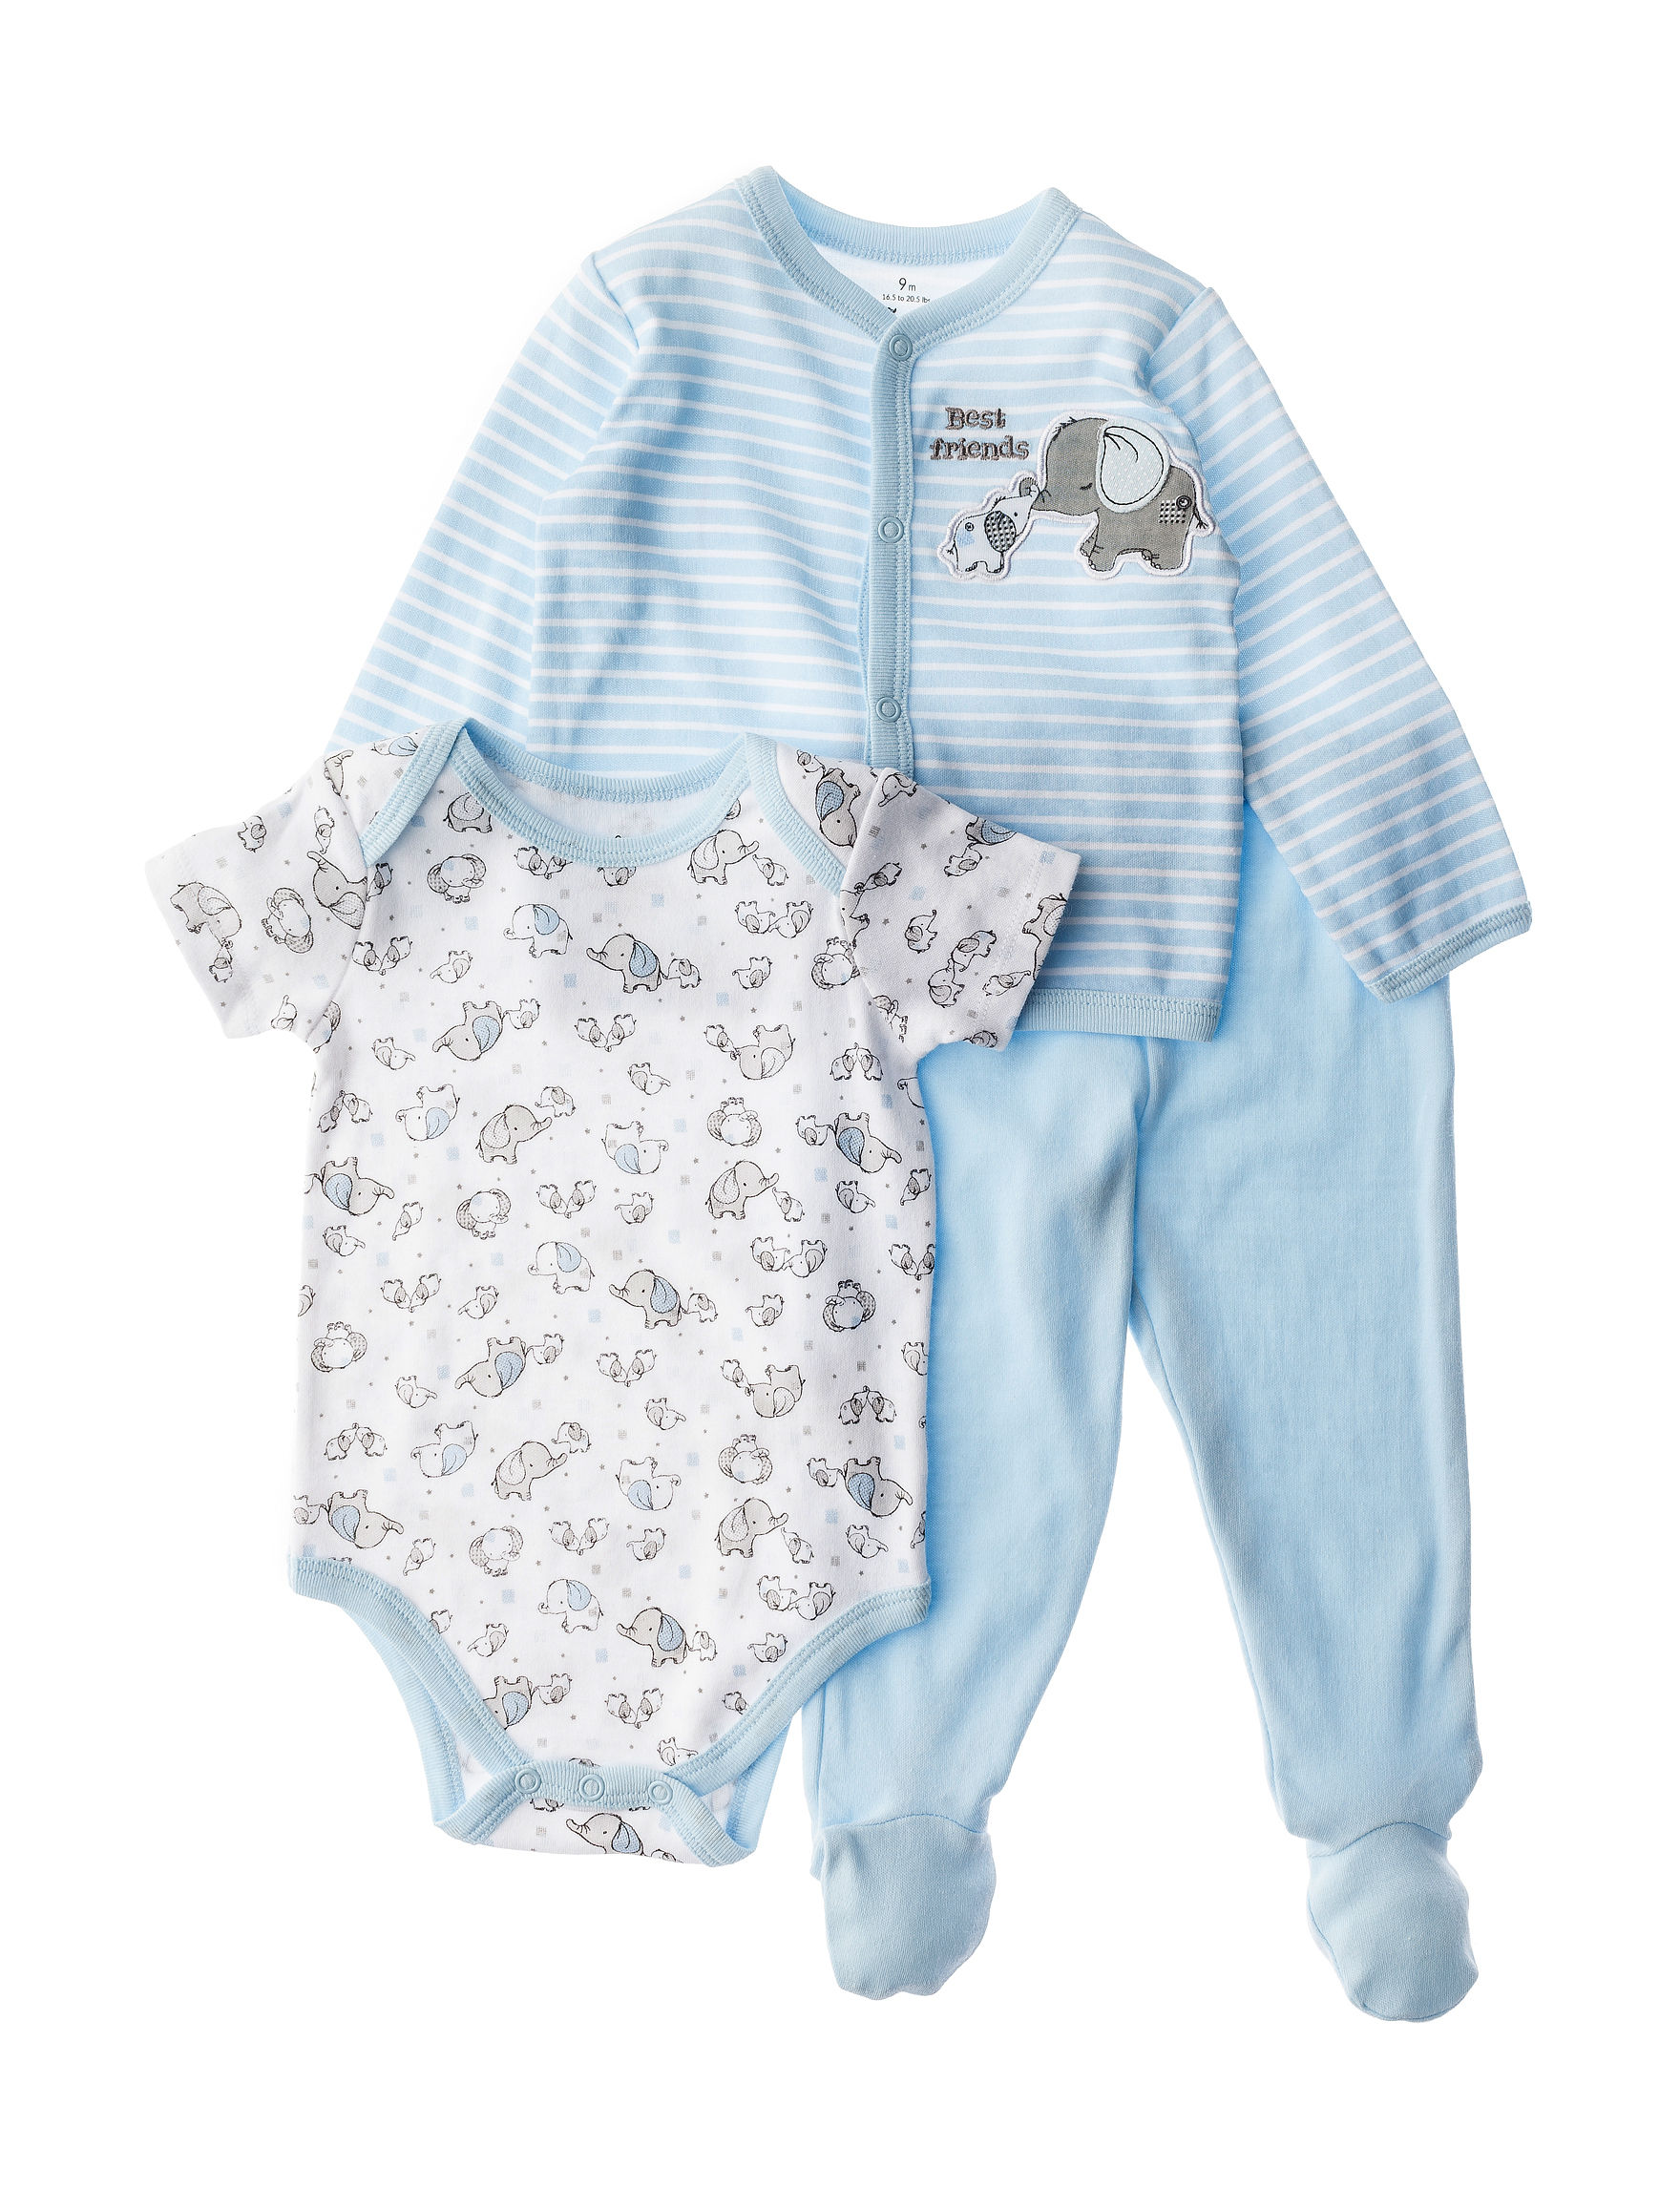 Baby Starters 3 pc Elephant Shirt Bodysuit & Sleeper Set Baby 3